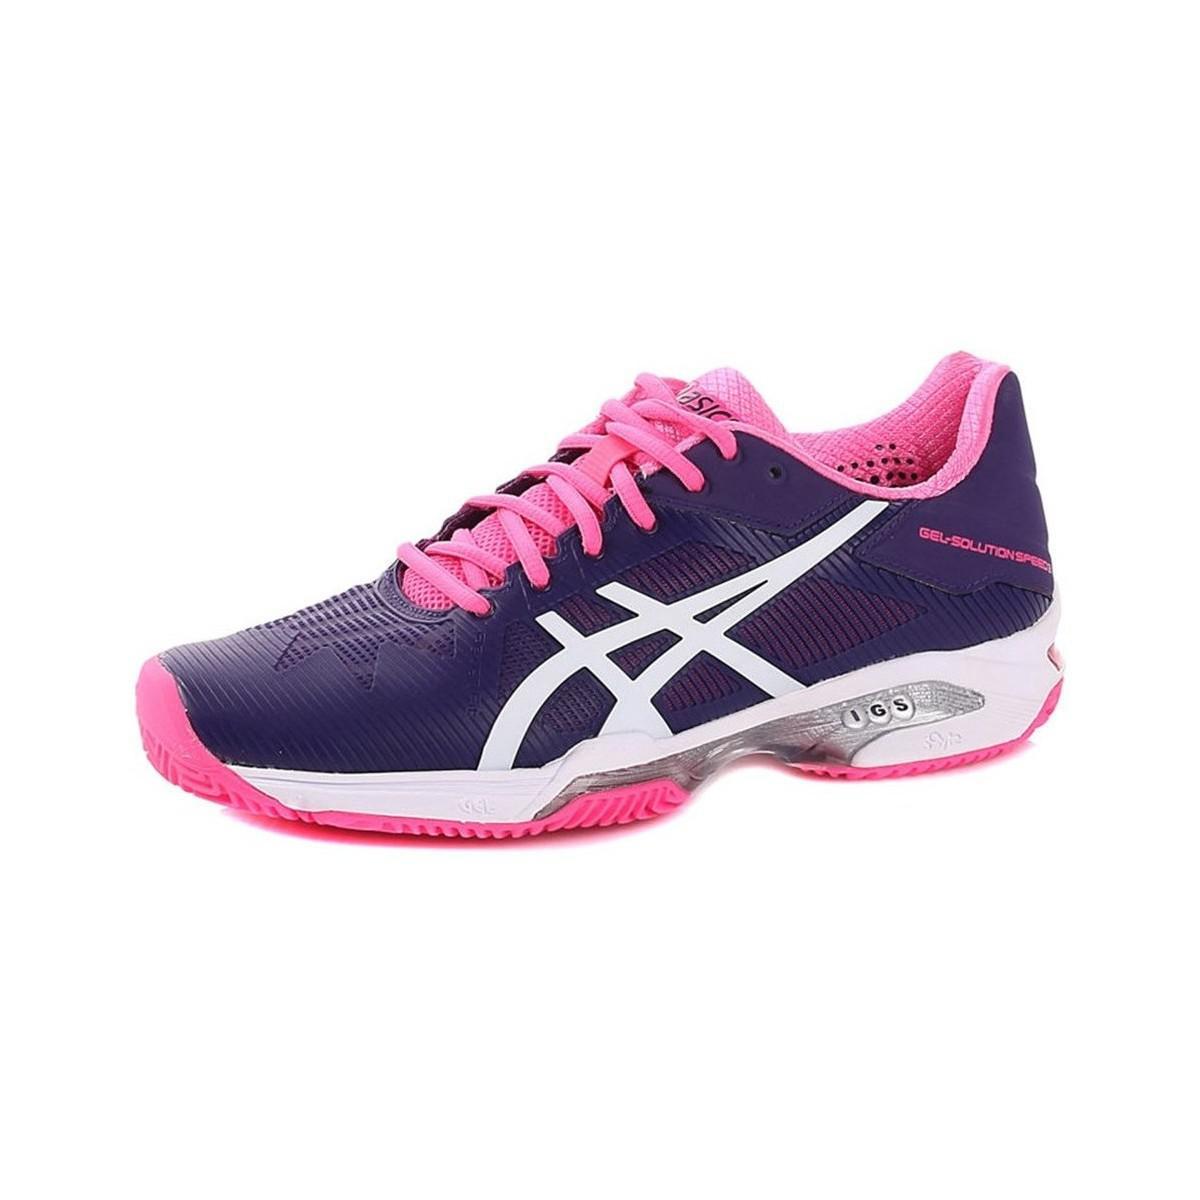 Manchester Great Sale Sale Online Asics Gelsolution Speed 3 Clay Womens women's Tennis Trainers (Shoes) in Discount Footlocker Pictures Amazon Online Cheap Footlocker Finishline Marketable Sale Online 41NL97YtEg